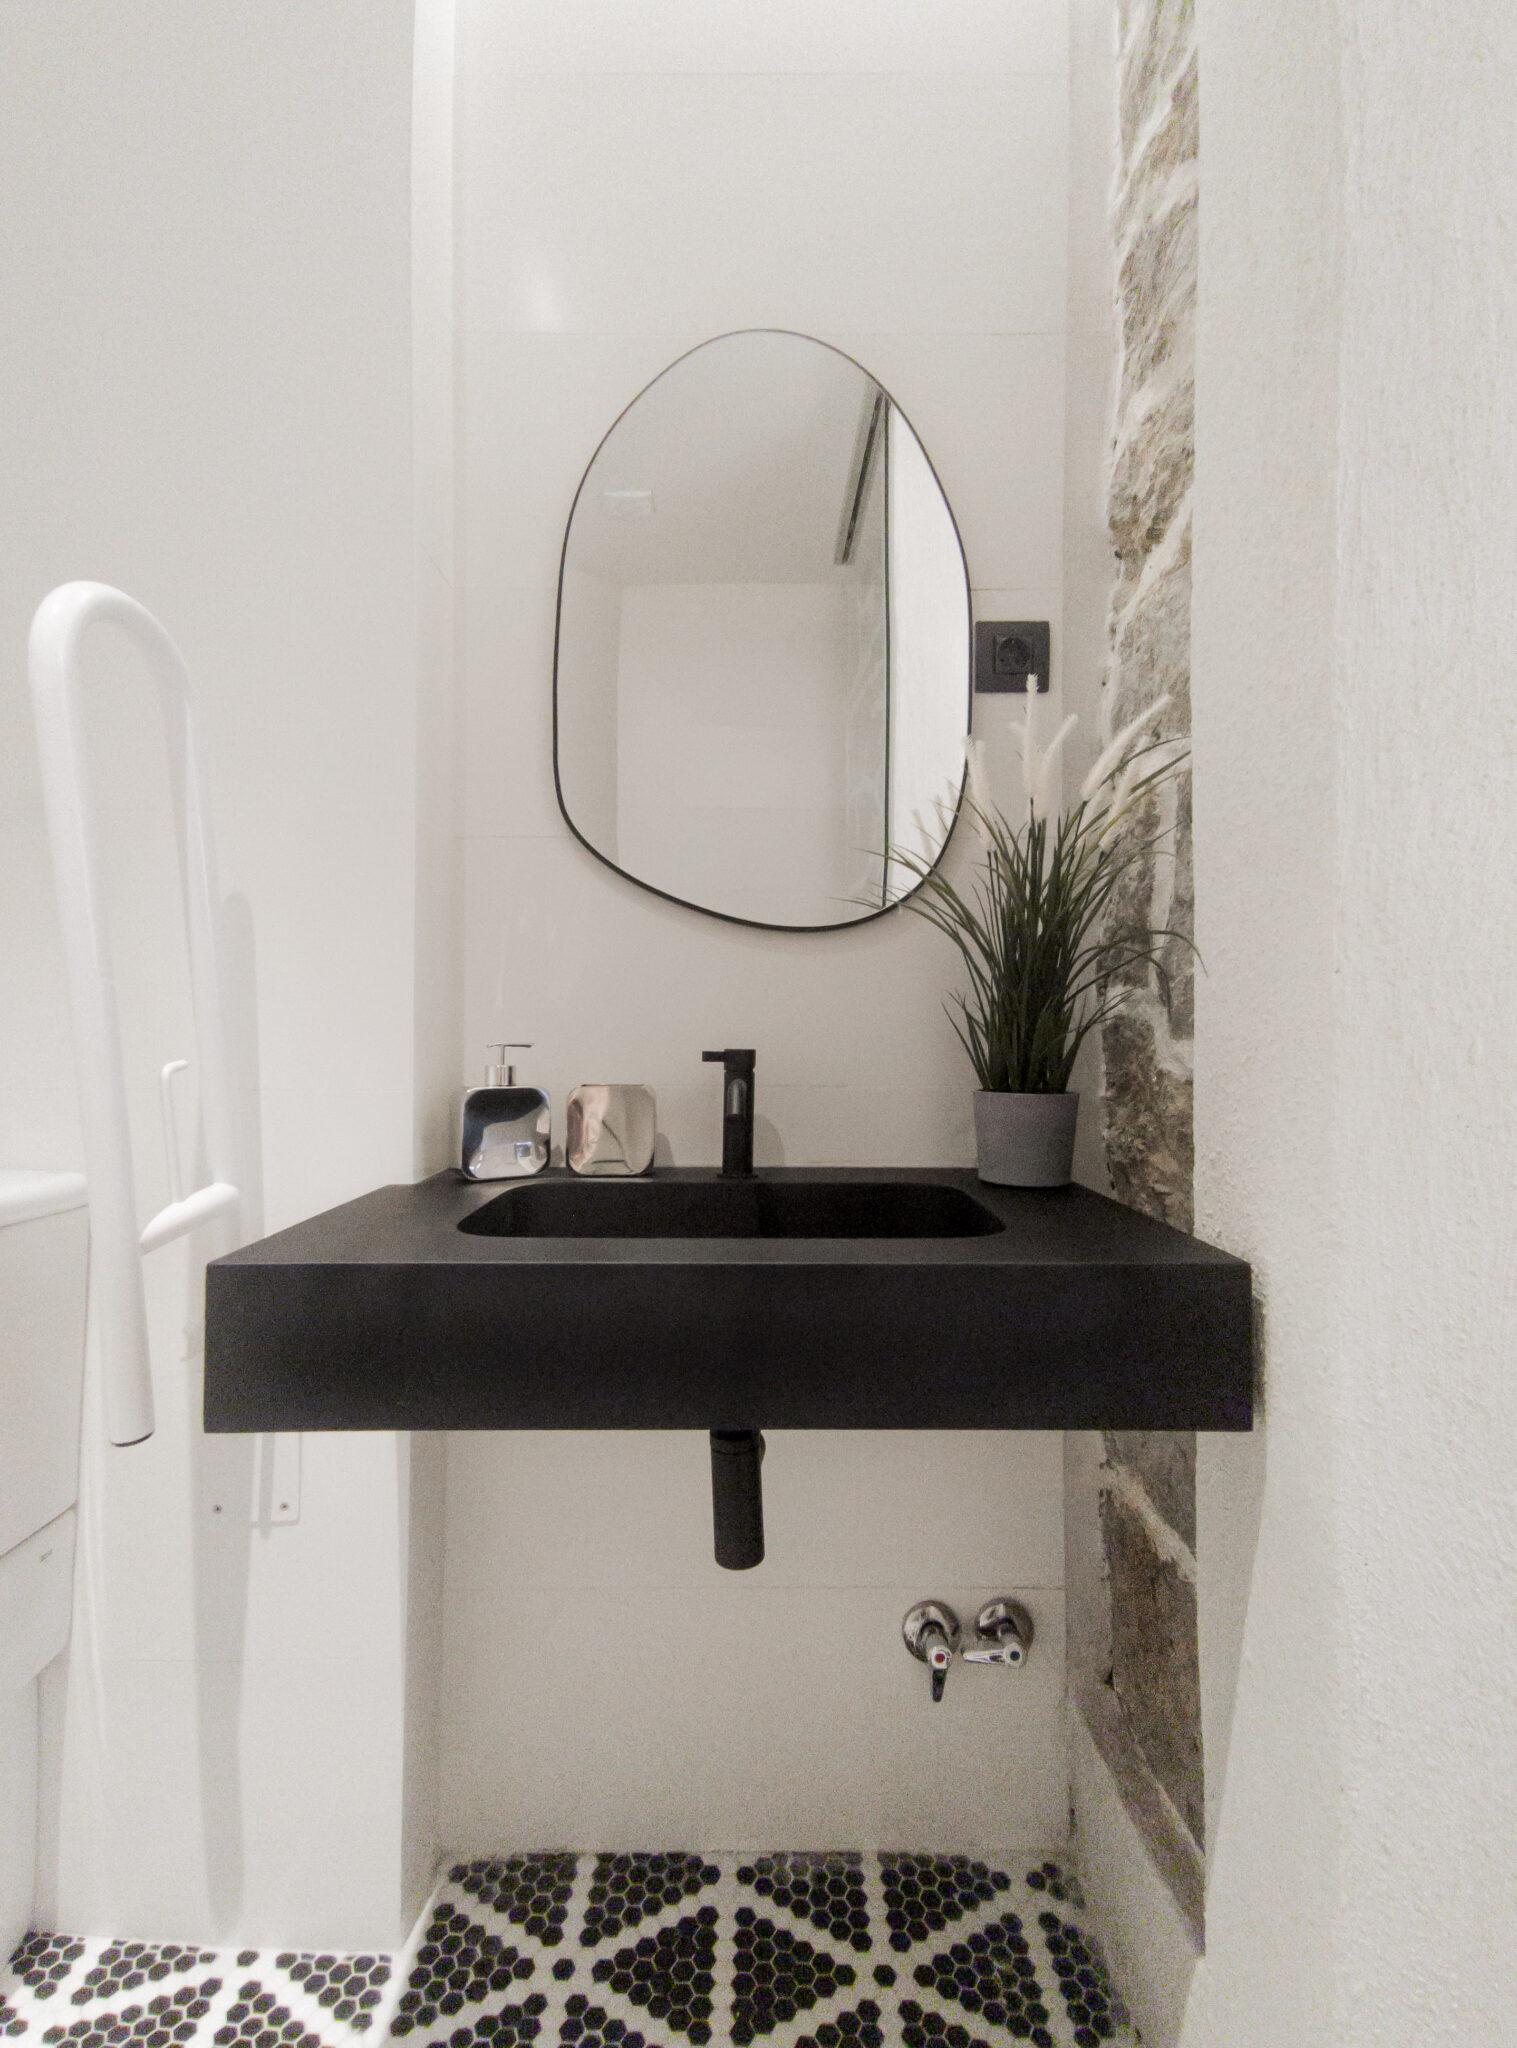 Proyecto-hisbalit-Baño adaptado con suelo Sonata | Ducha | Black & White-baNo sonata black white hotel arimune baNo adaptado 4